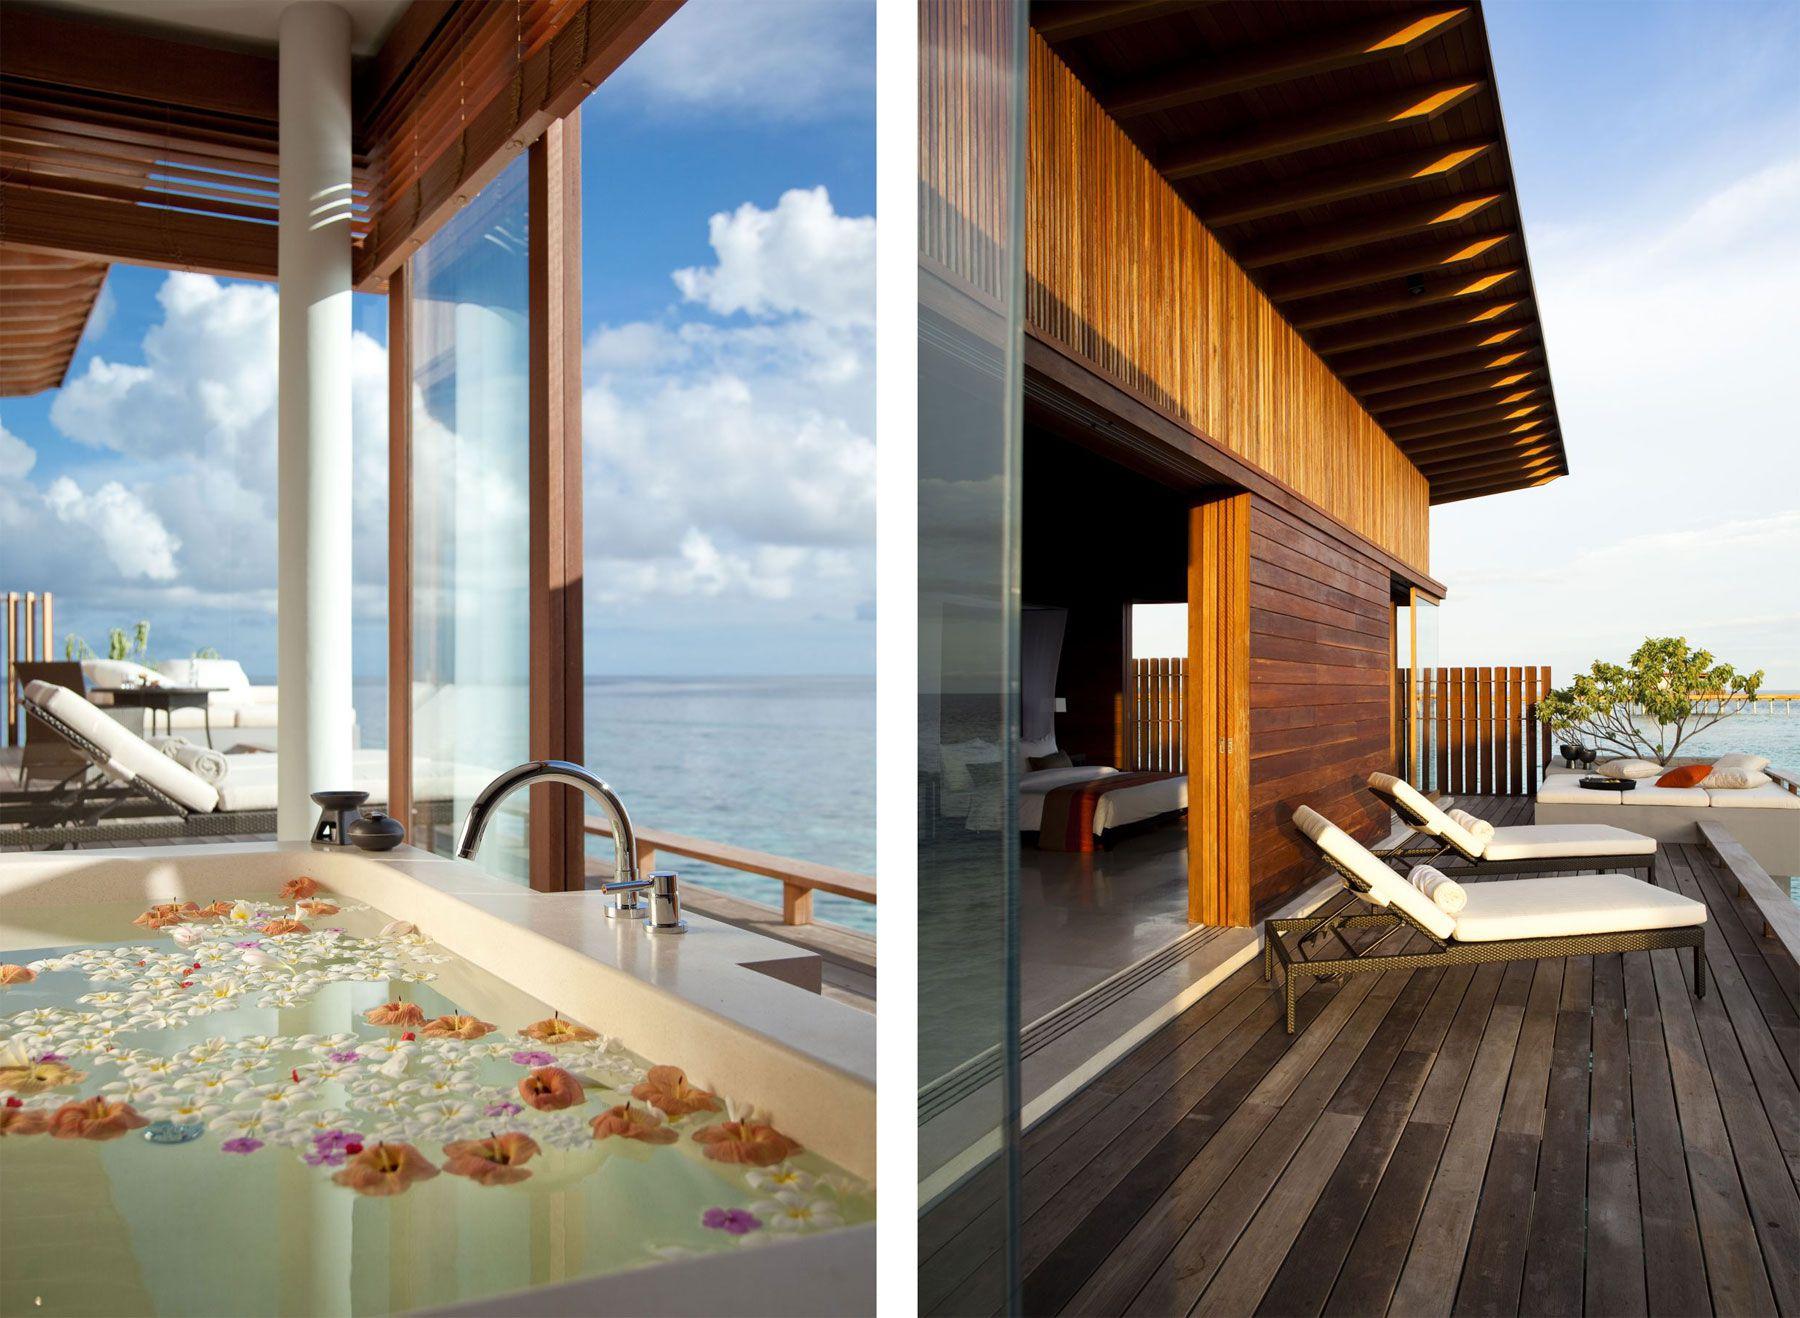 Alila-Villas-Hadahaa-in-Maldives-06